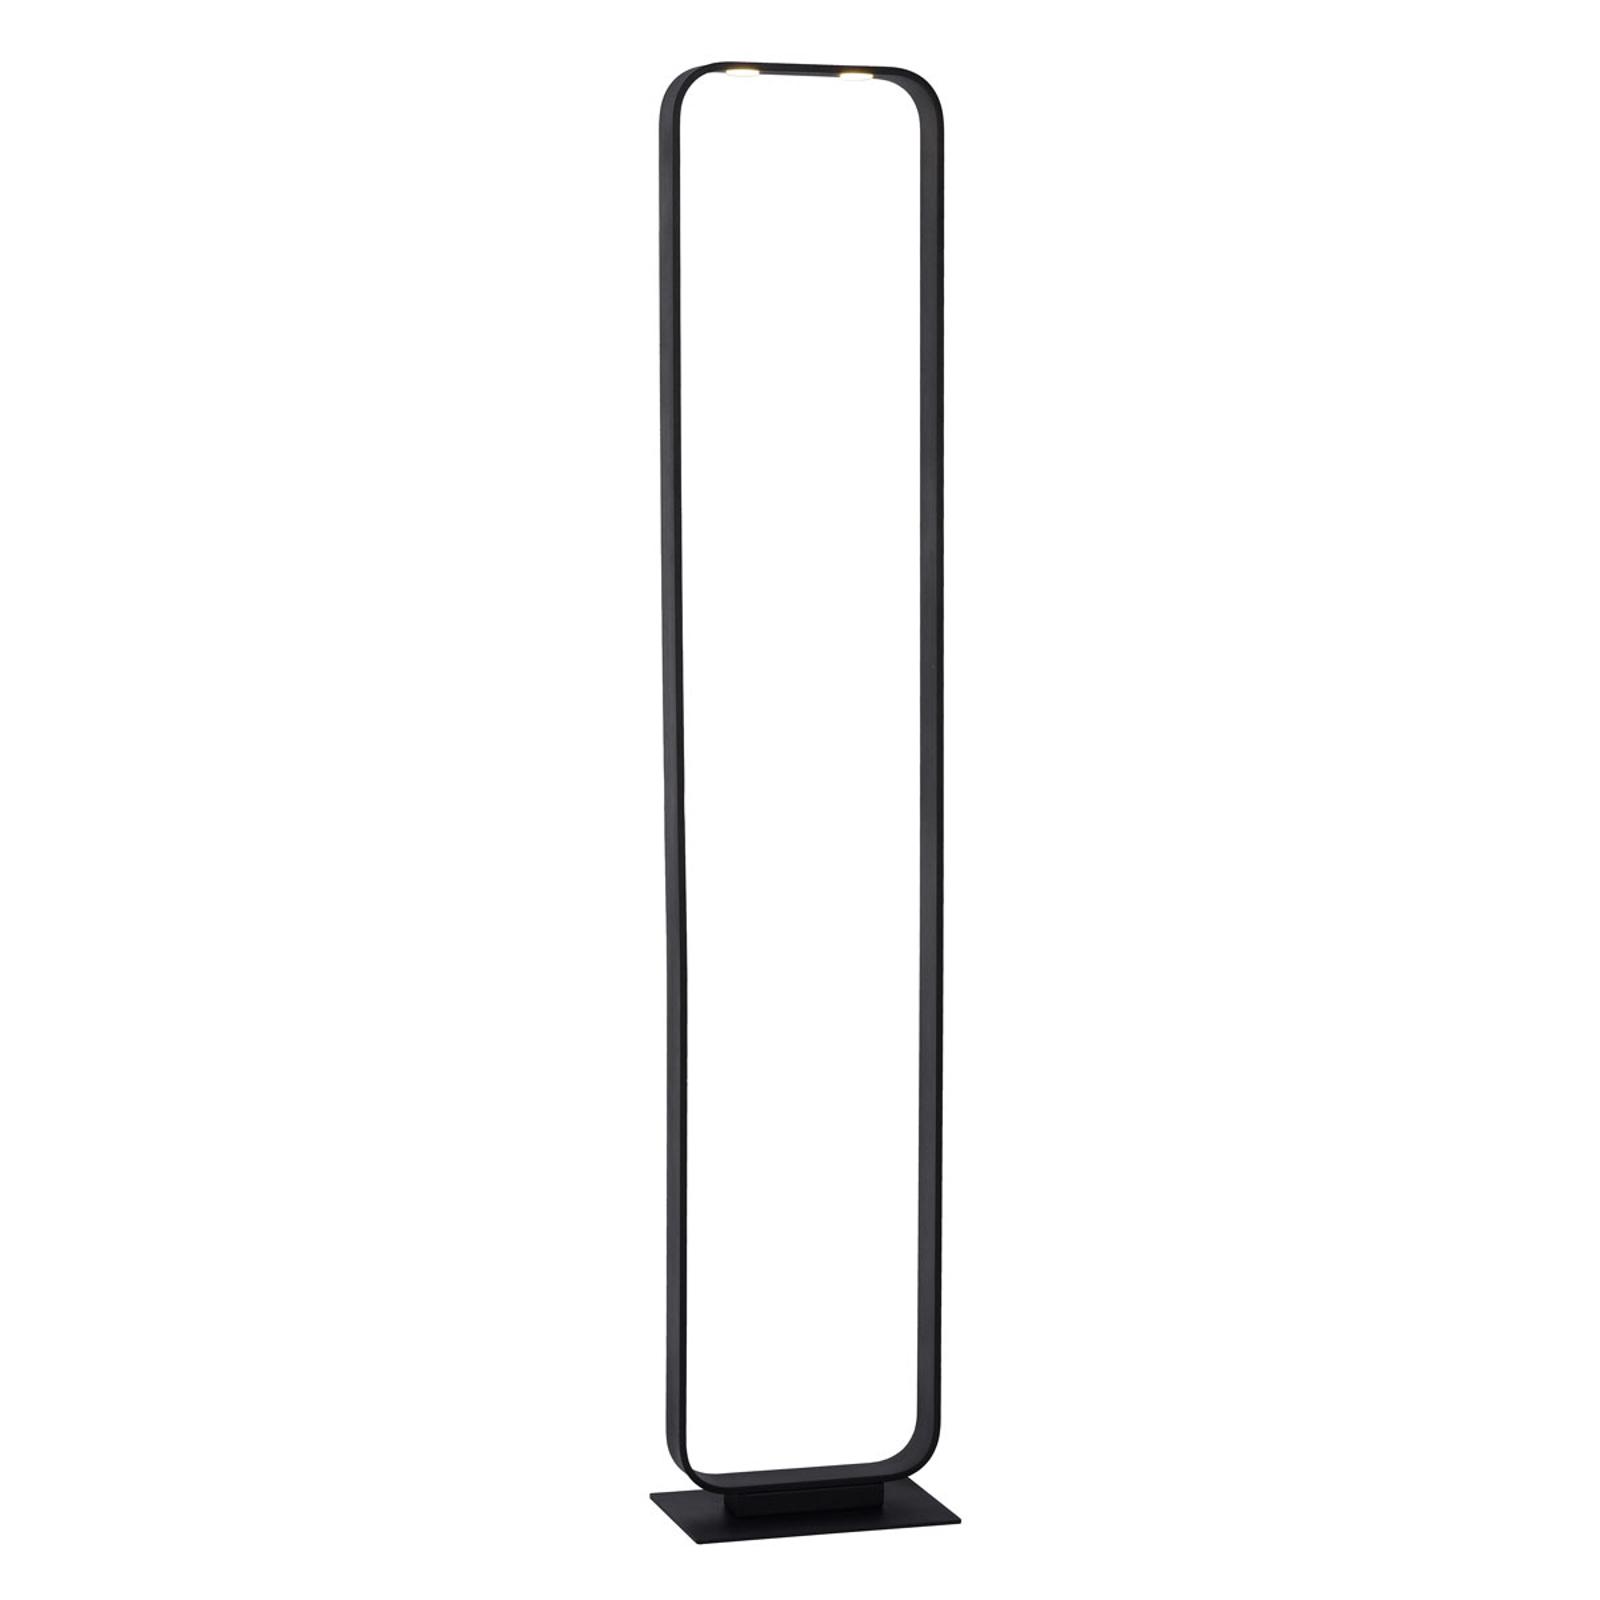 LED vloerlamp Mika in framevorm